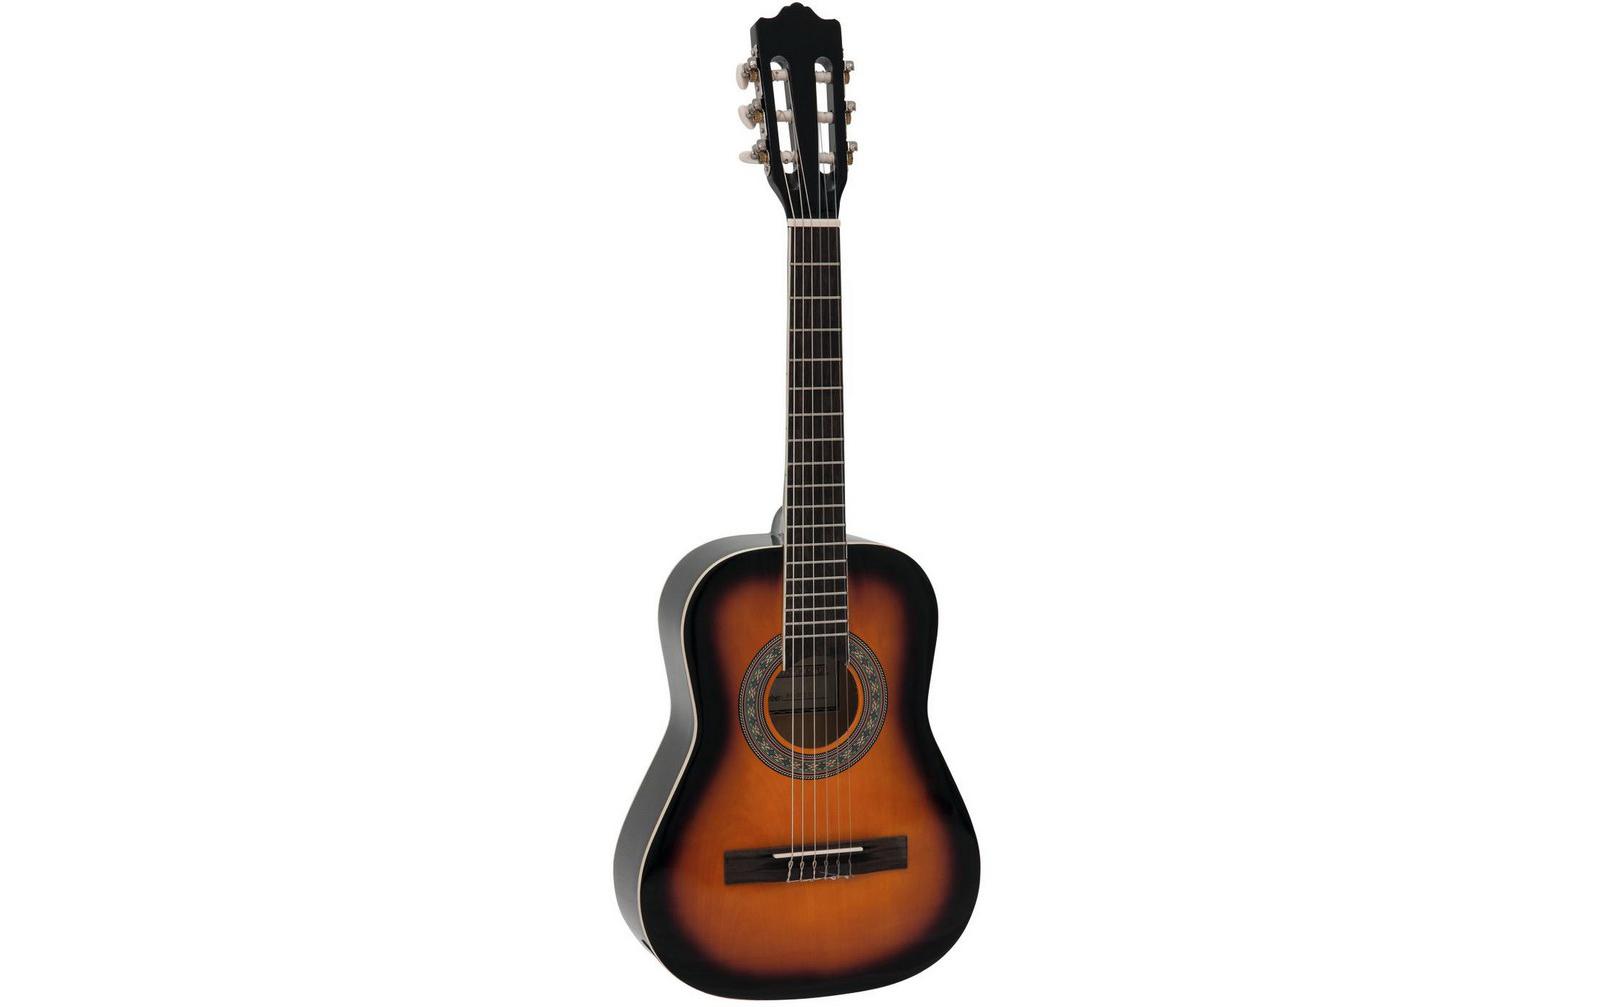 dimavery-ac-303-klassik-gitarre-1-2-sunburst